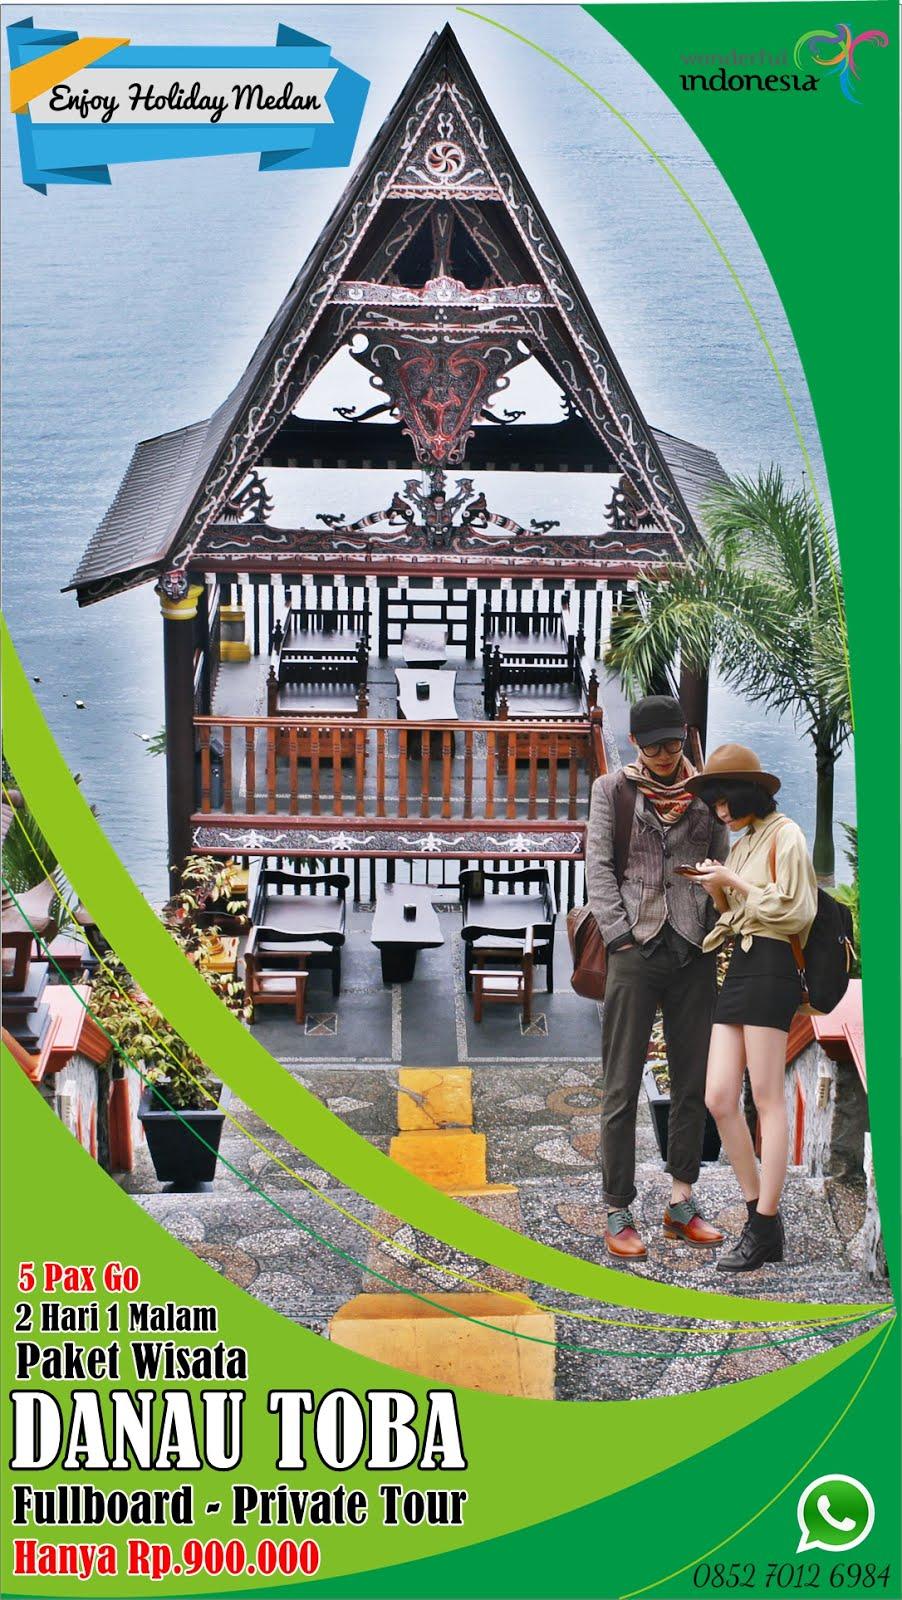 2H1M Paket Tour Danau Toba Murah